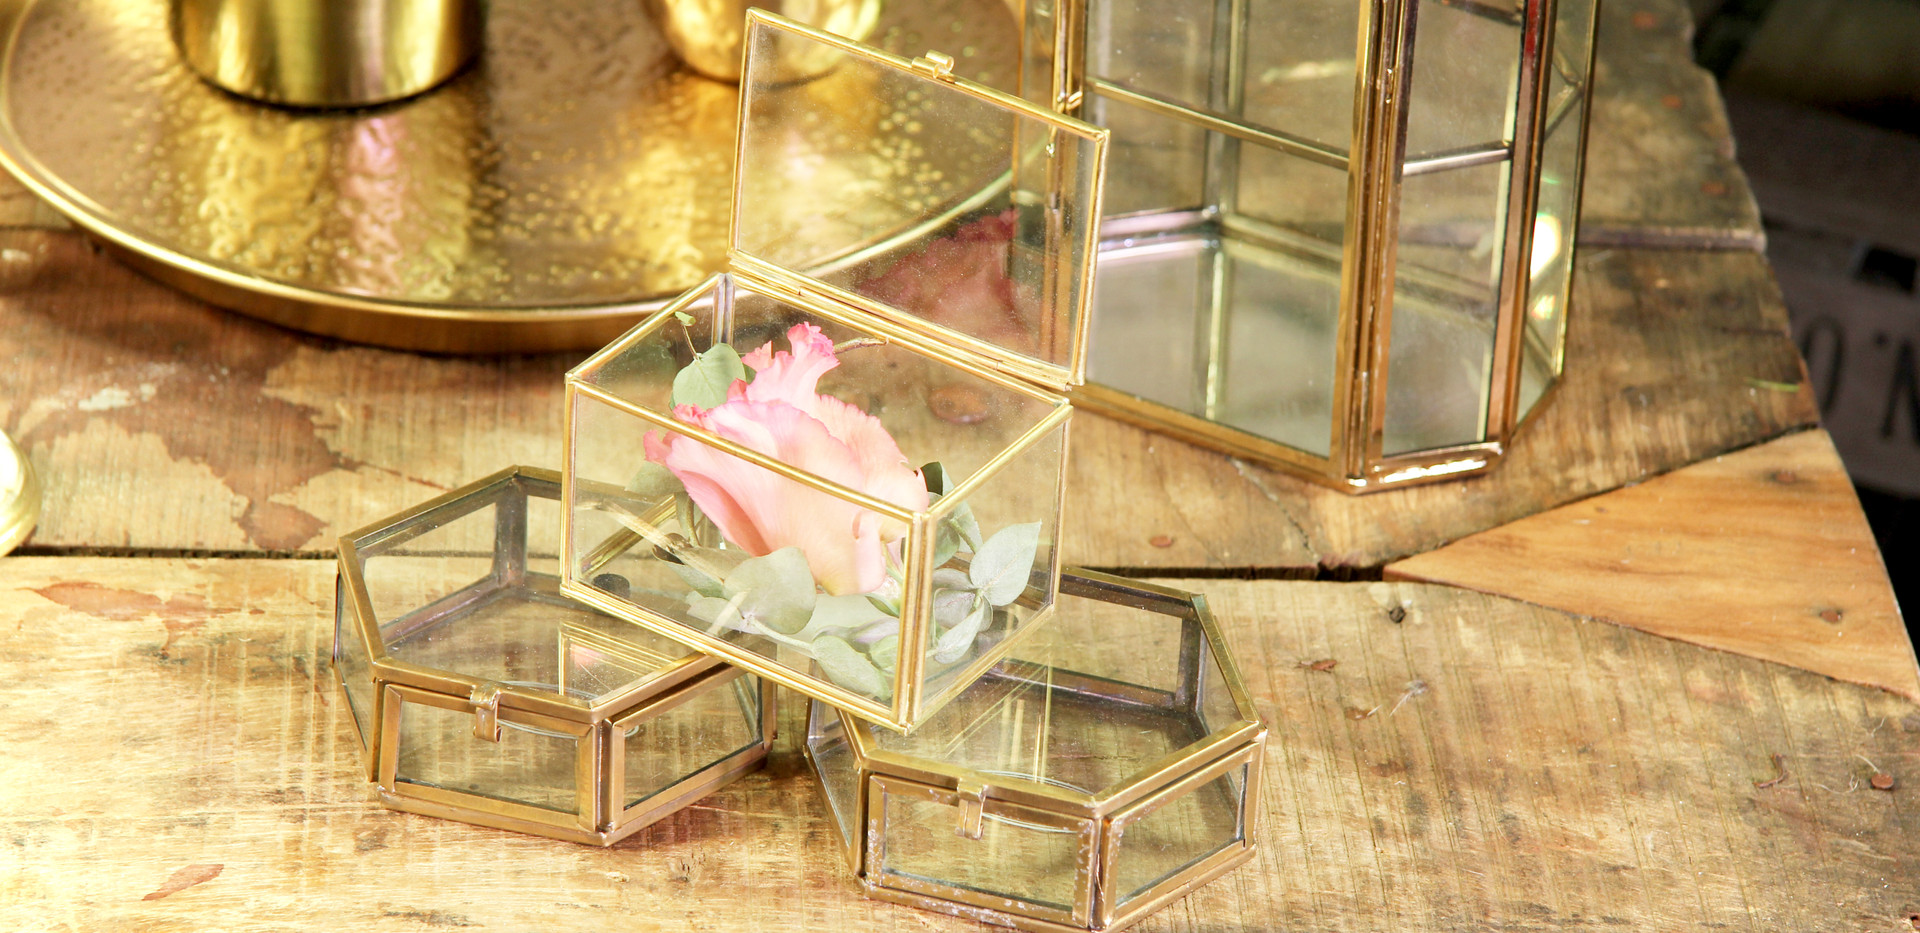 Goldene Kästchen klein - Je Stk. 1,50 Euro - groß je Stk. 4,50 Euro